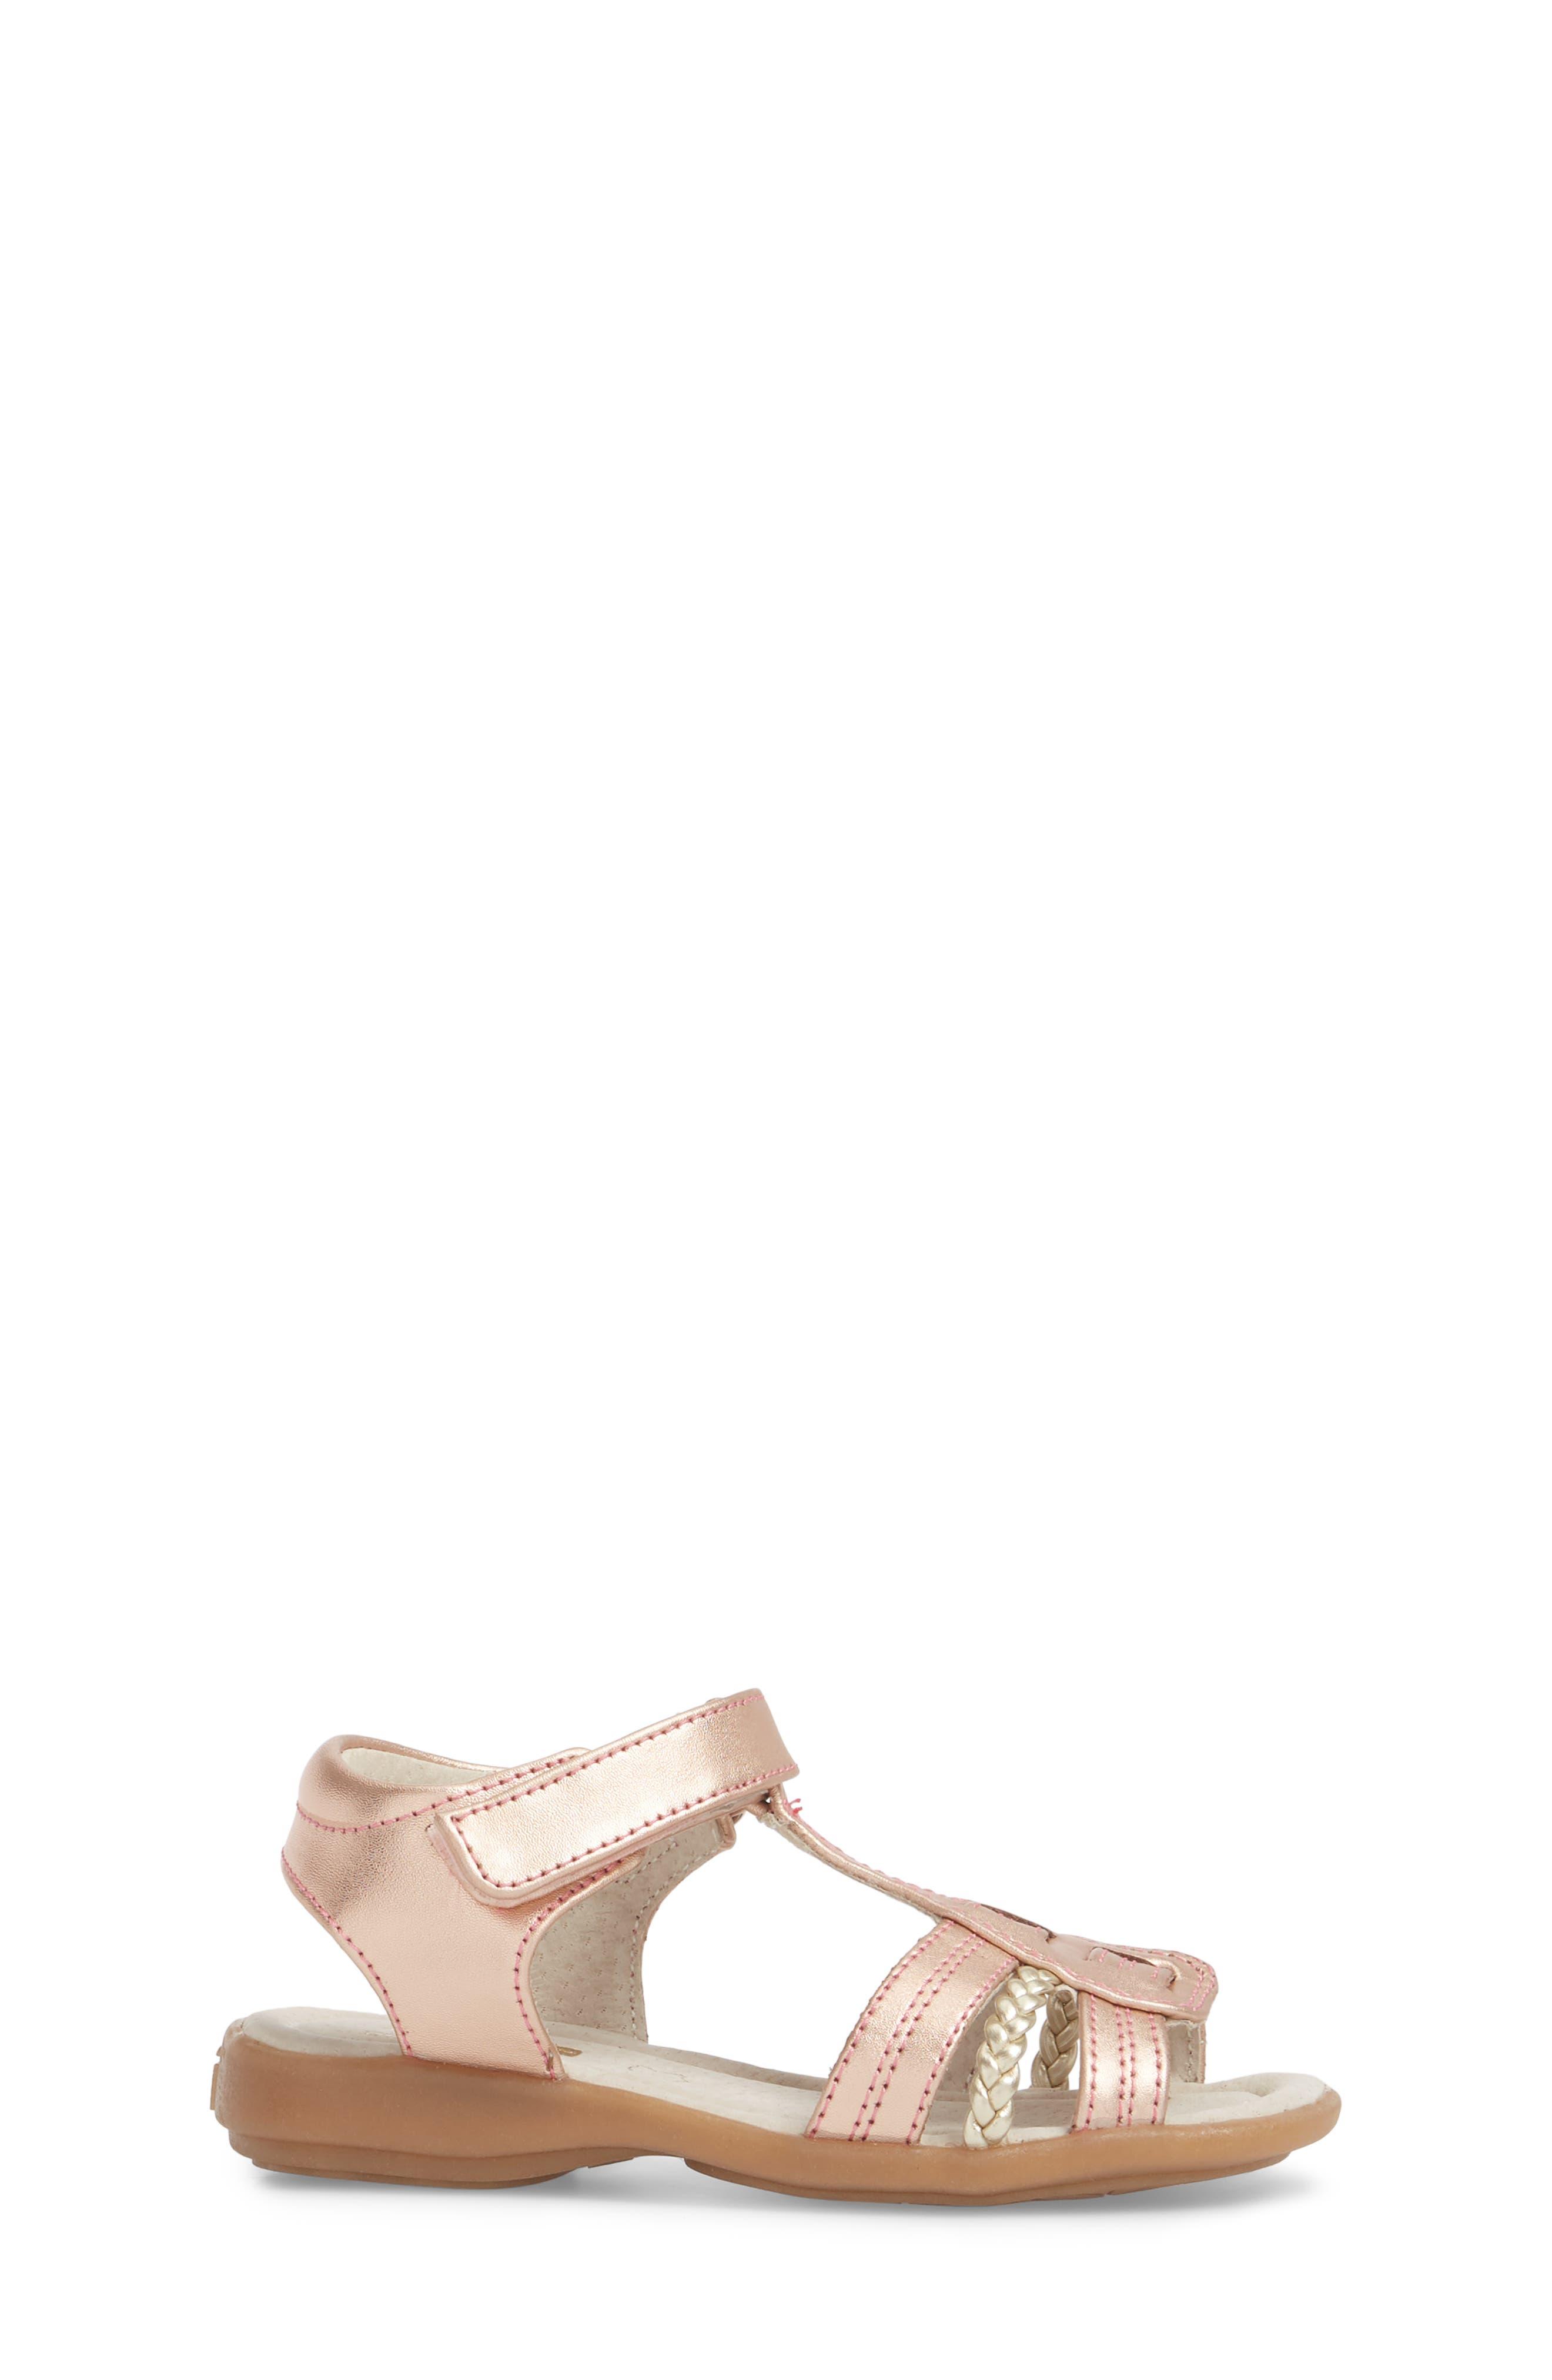 Hadley Metallic Sandal,                             Alternate thumbnail 3, color,                             Rose Gold